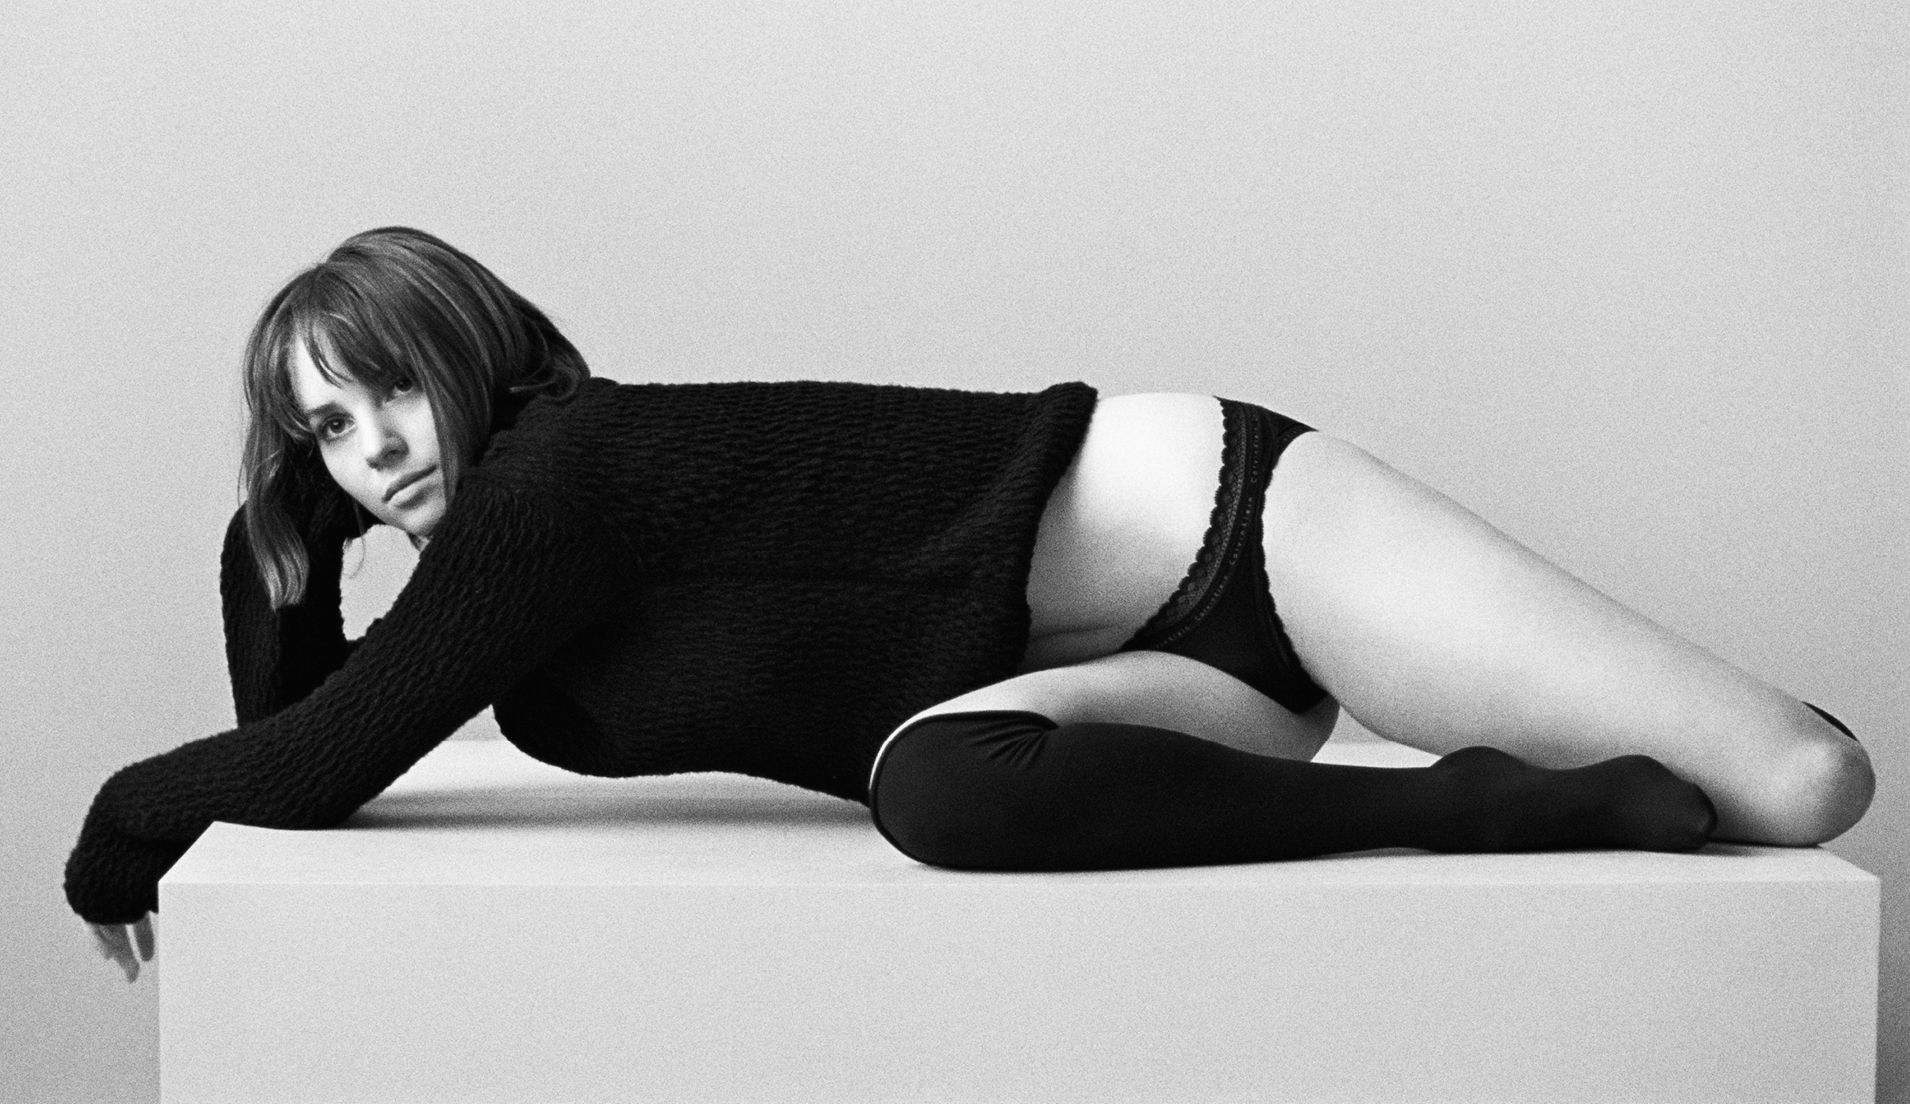 Maya Hawke Wears The Signature Plunge Unlined Bra And Bikini